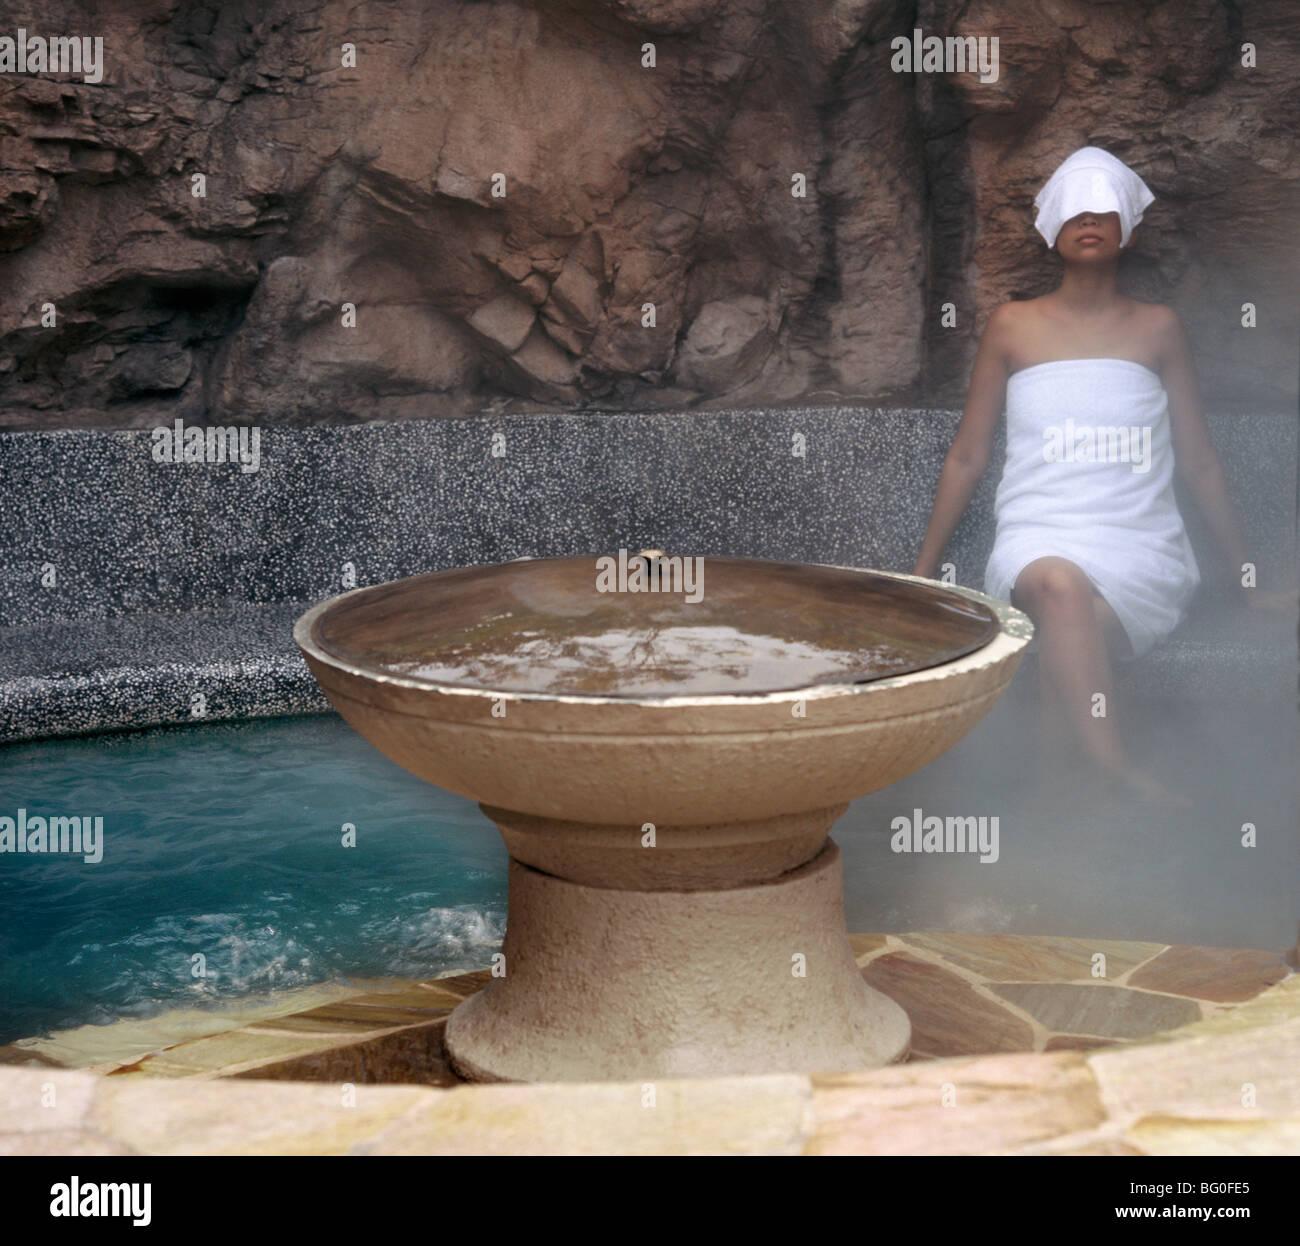 Spa Bath And Southeast Asia Stock Photos & Spa Bath And Southeast ...